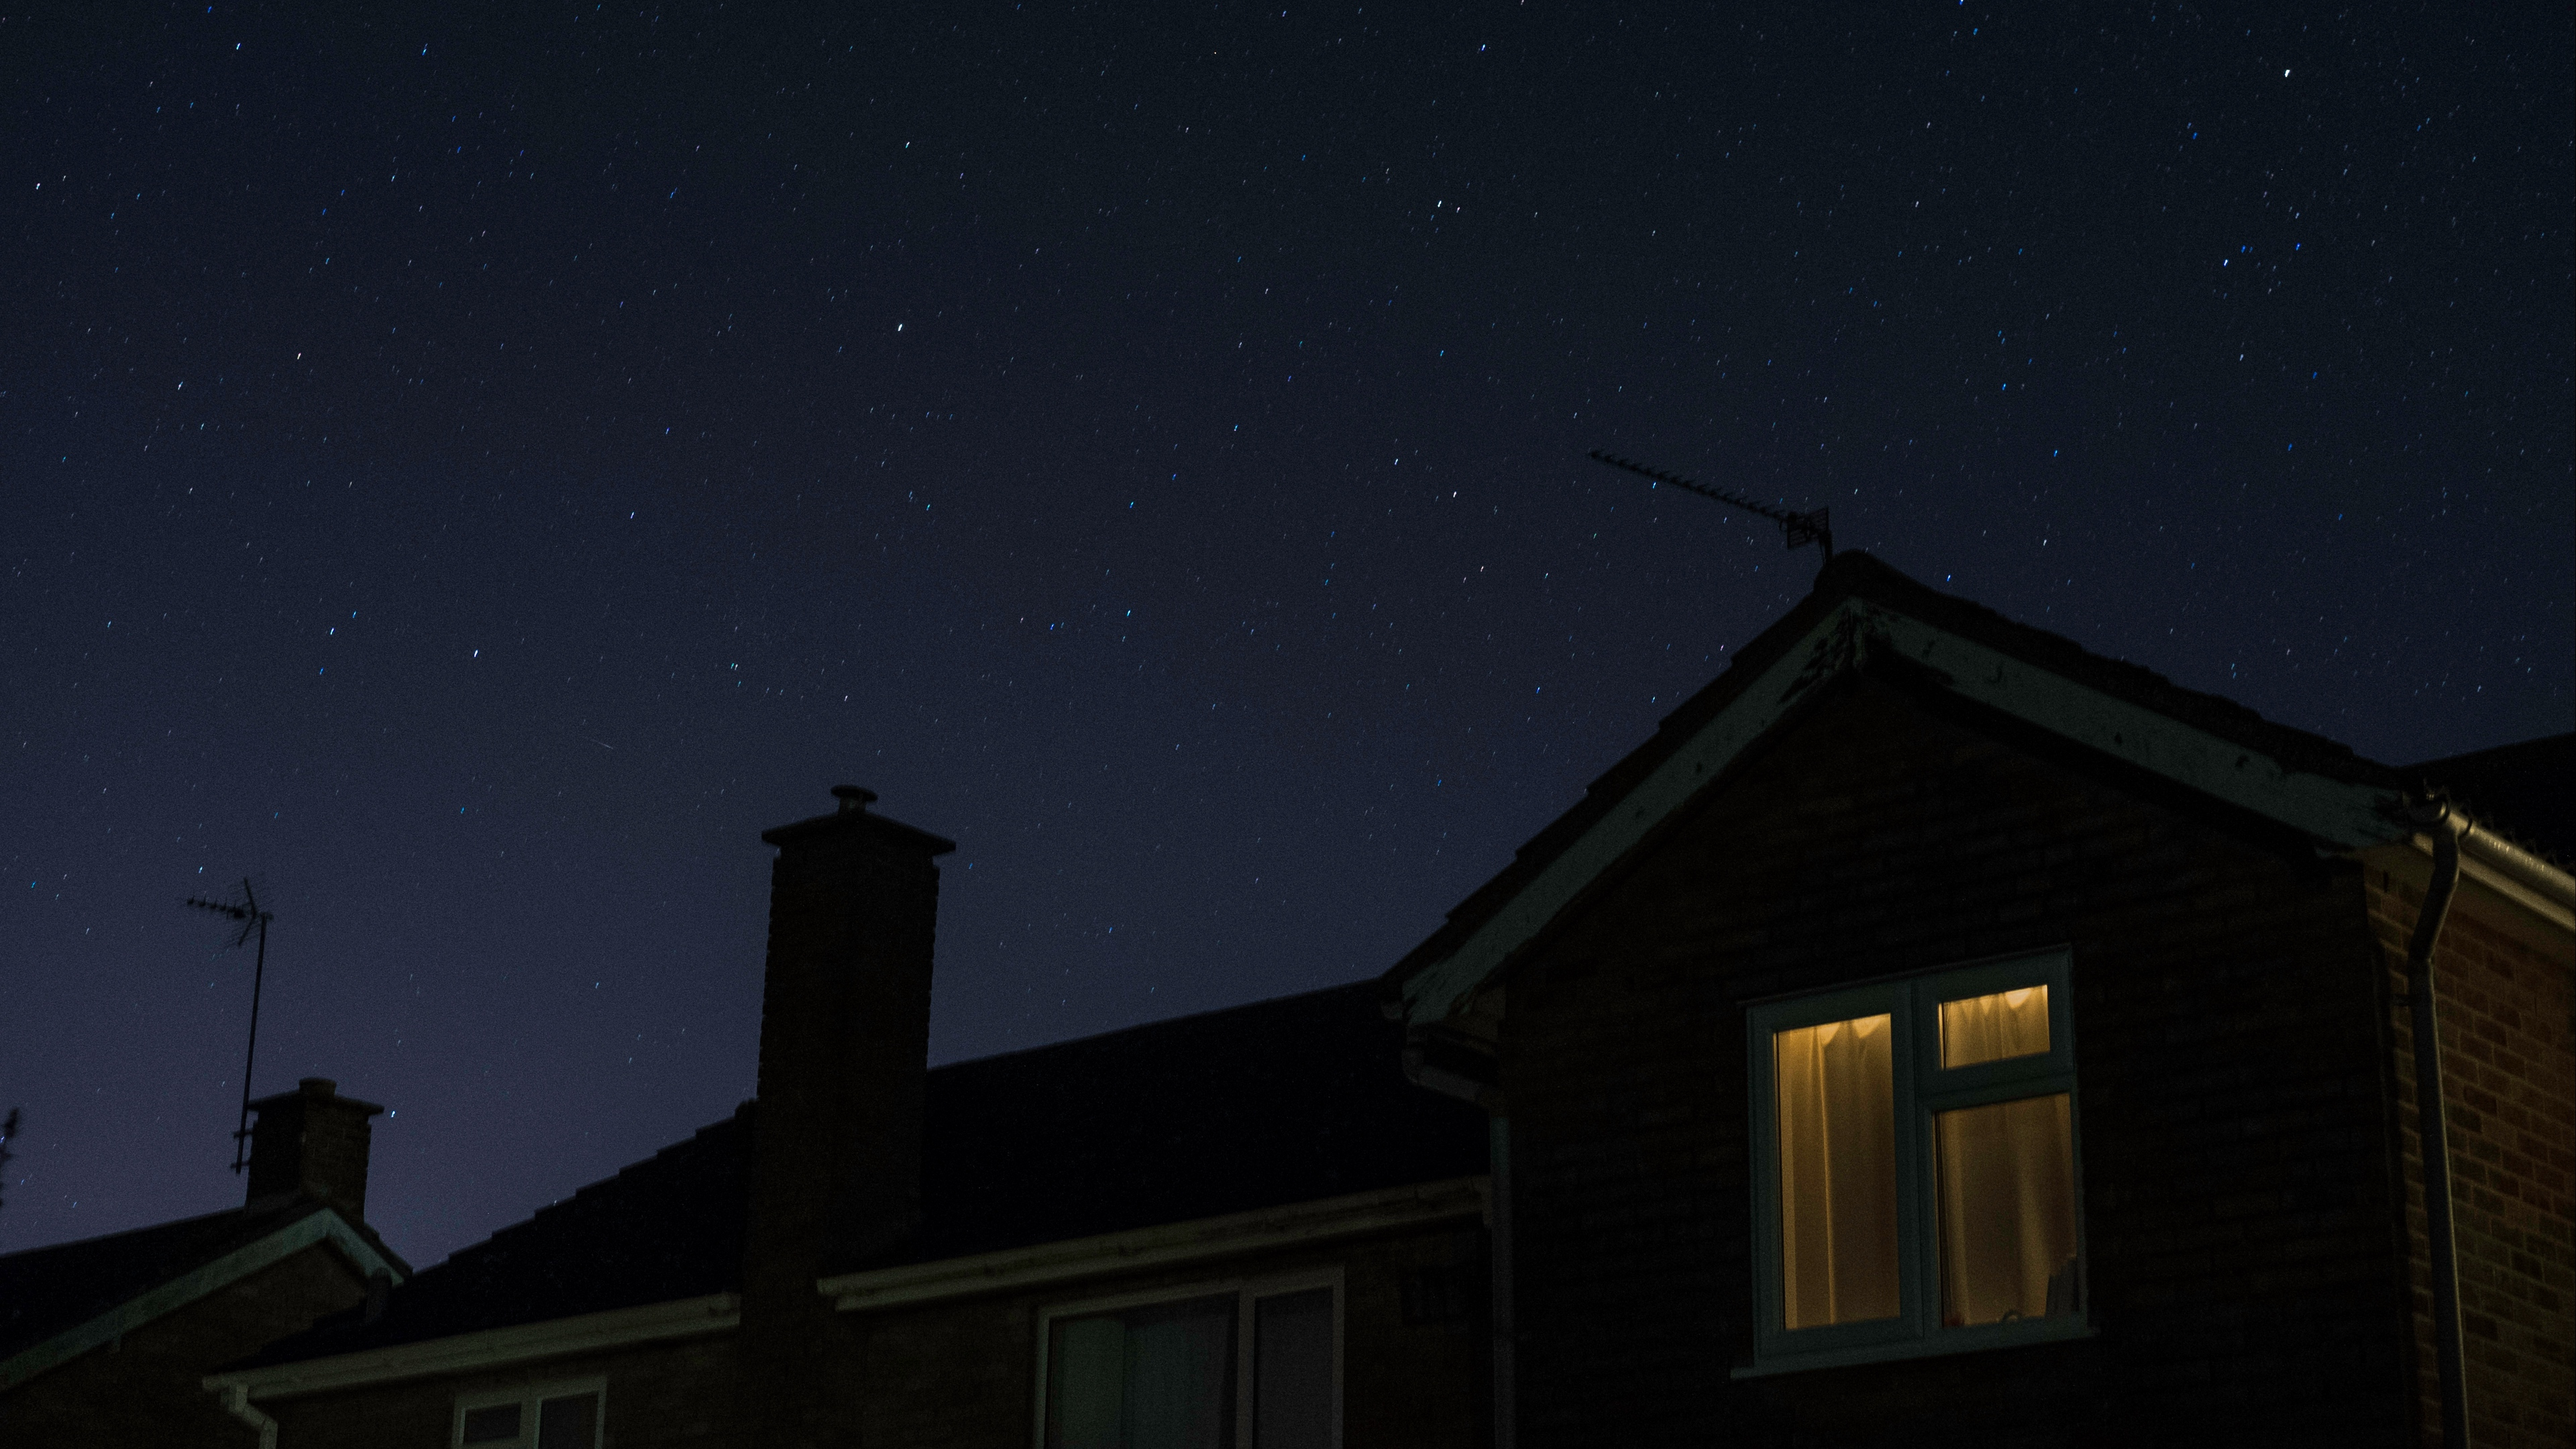 window starry sky night 4k 1540574867 - window, starry sky, night 4k - Window, starry sky, Night